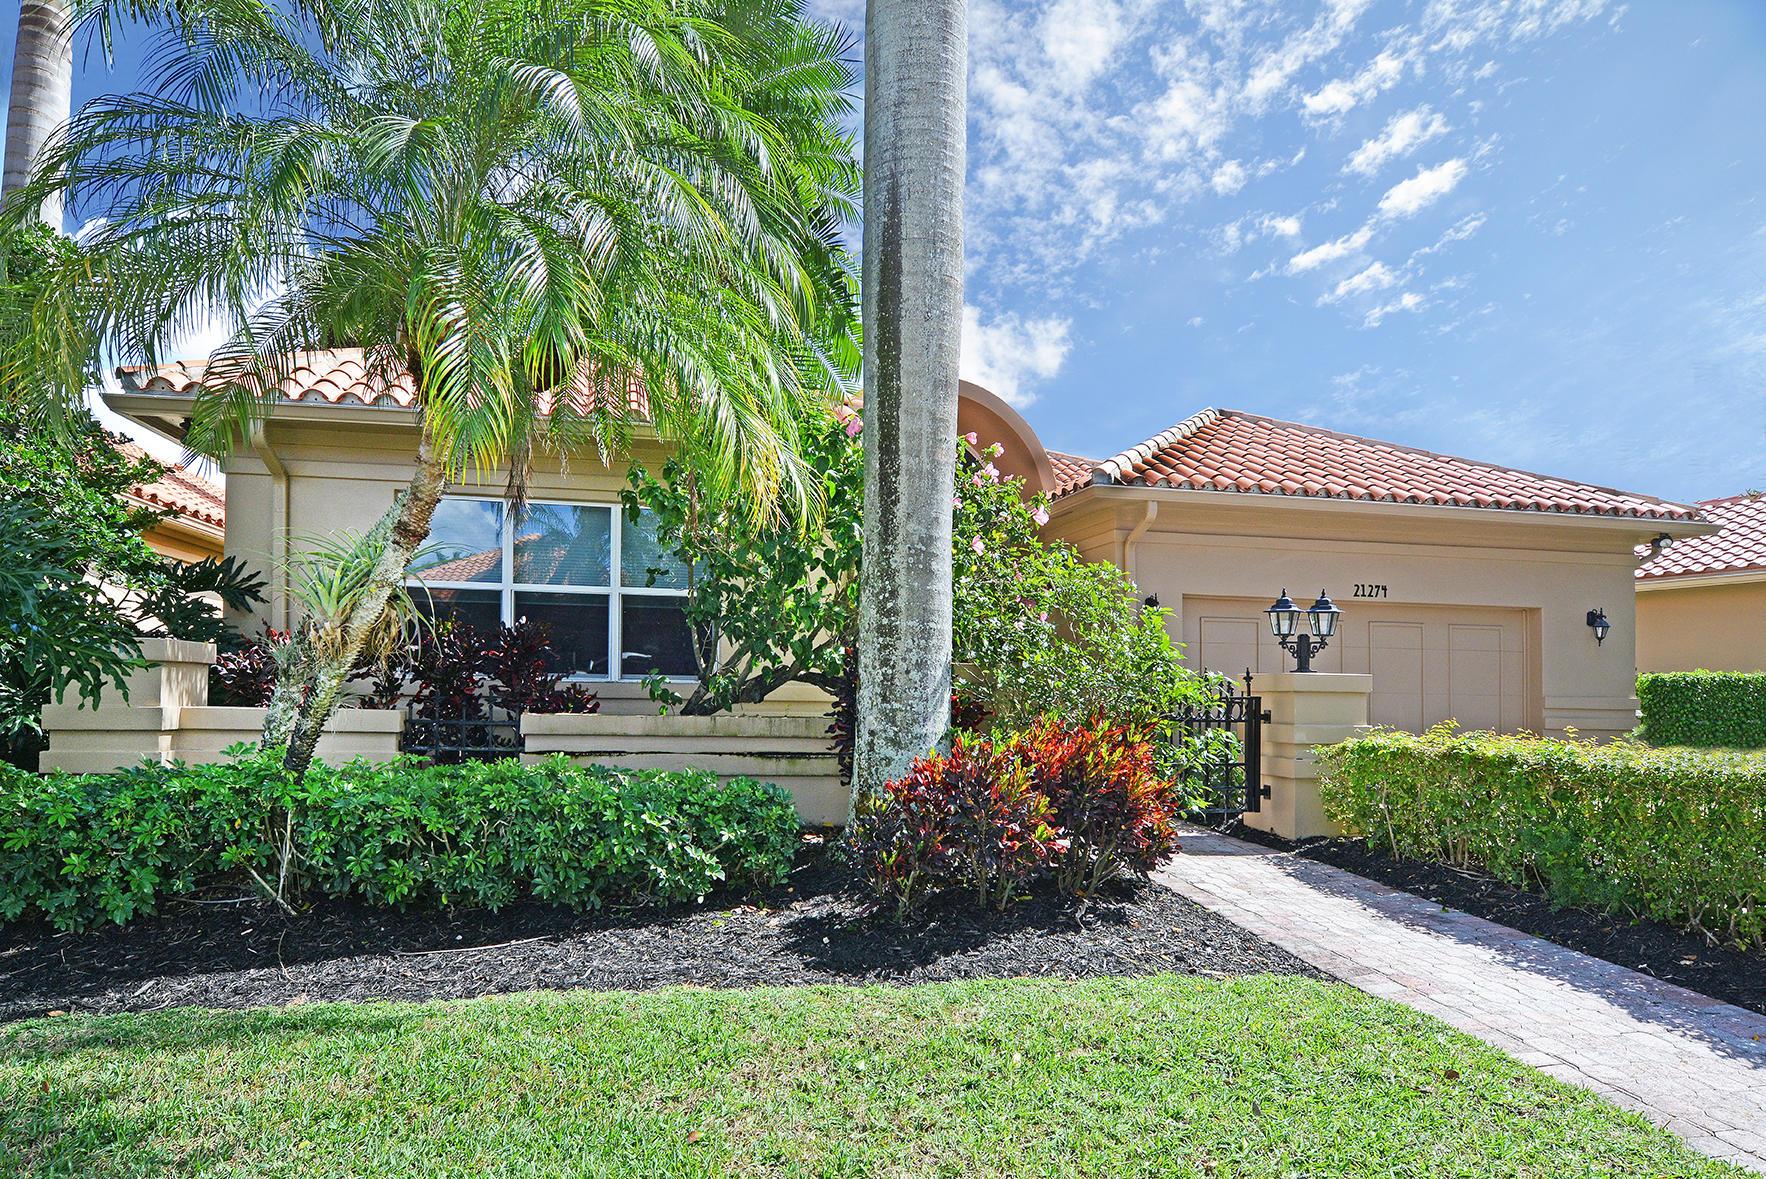 21274 Harrow Court Boca Raton, FL 33433